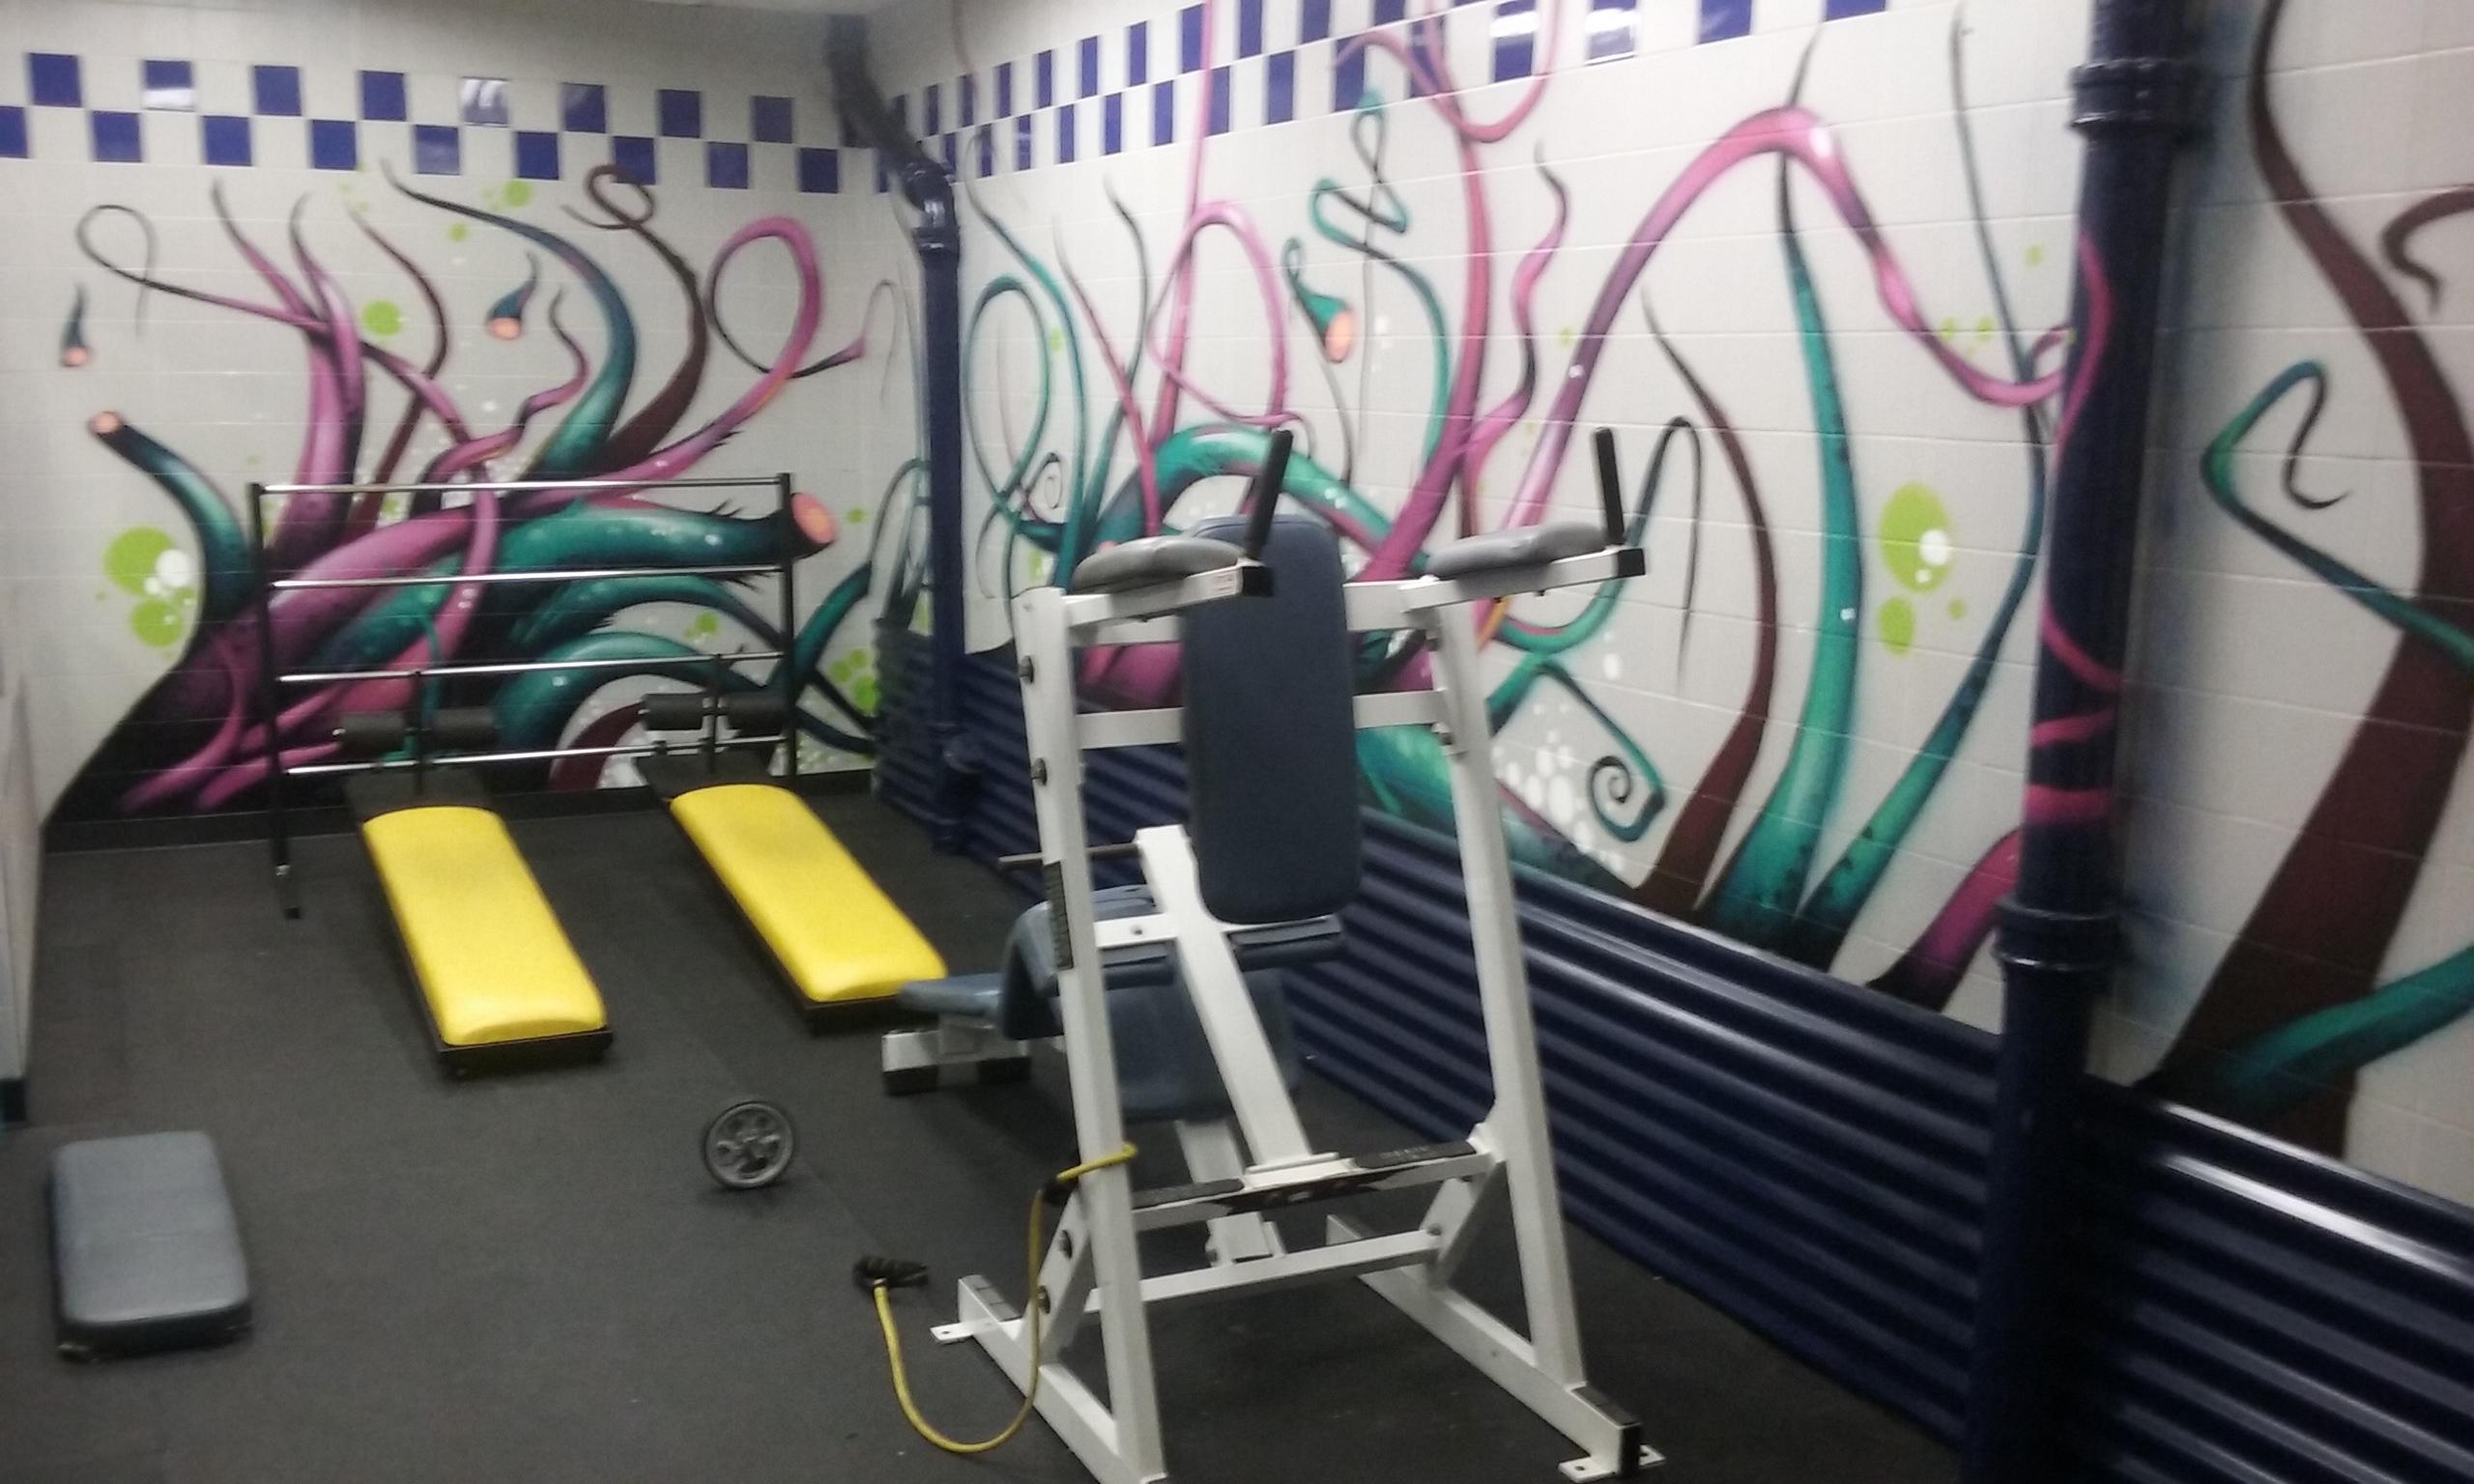 Everybodies Gym image 5